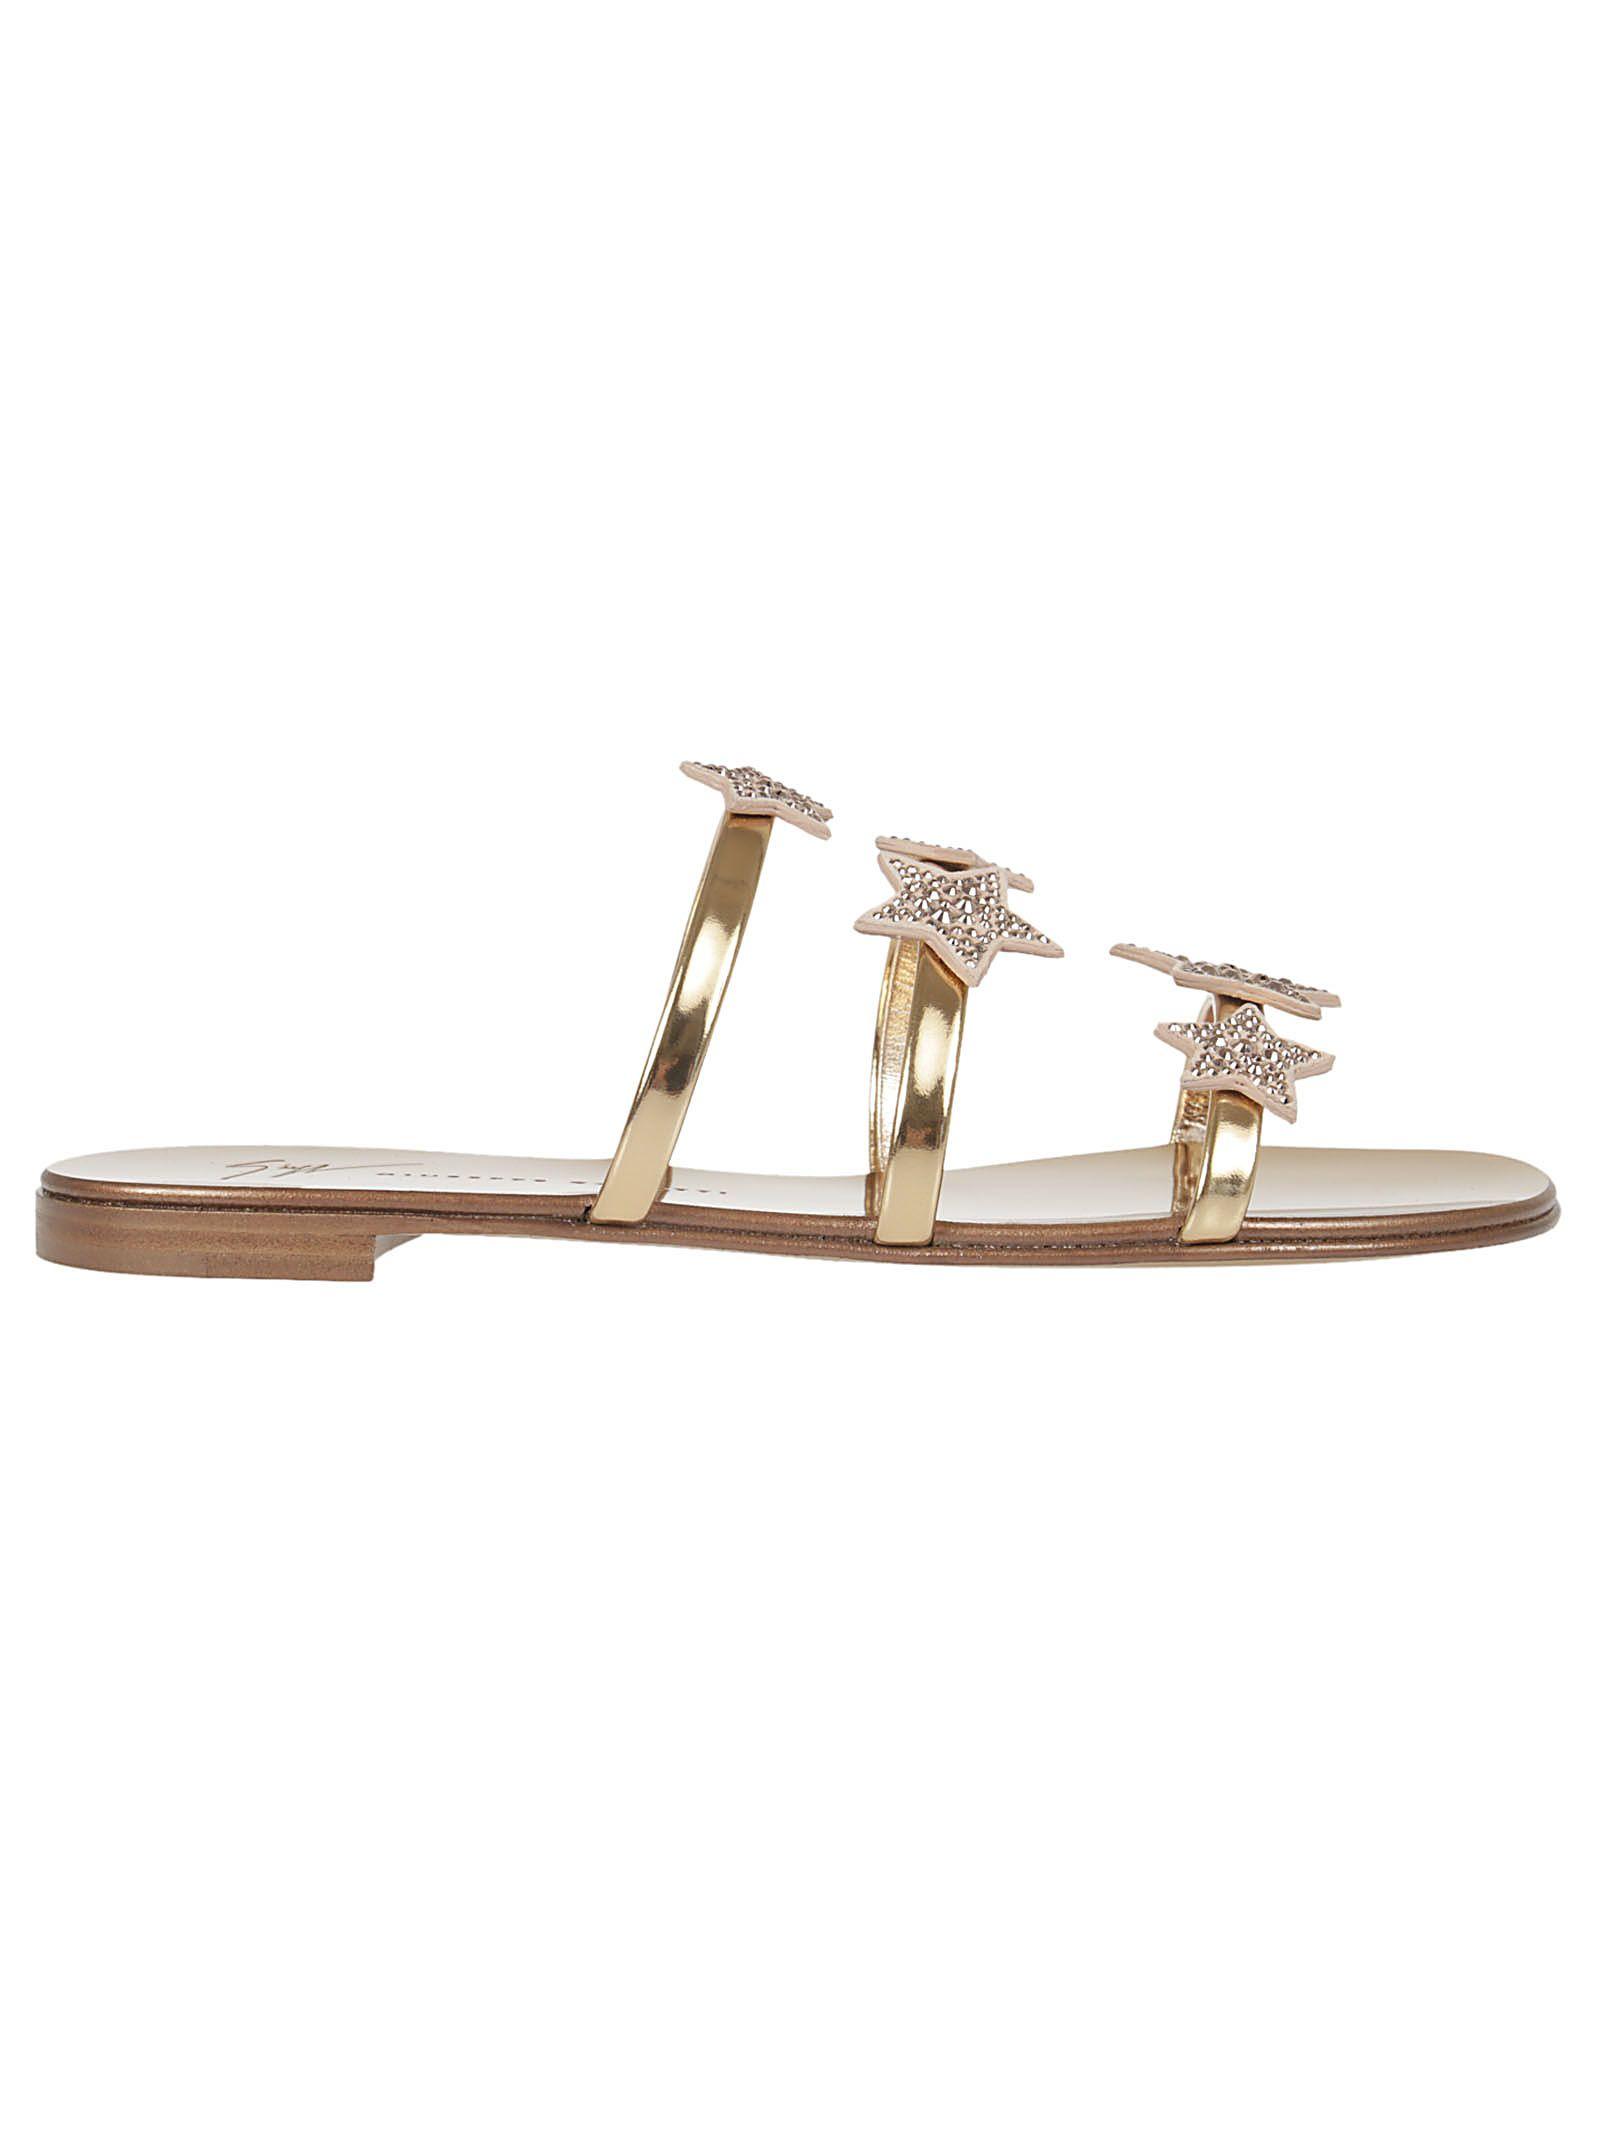 1558a1672bf Giuseppe Zanotti Metallic Star Flat Sandals